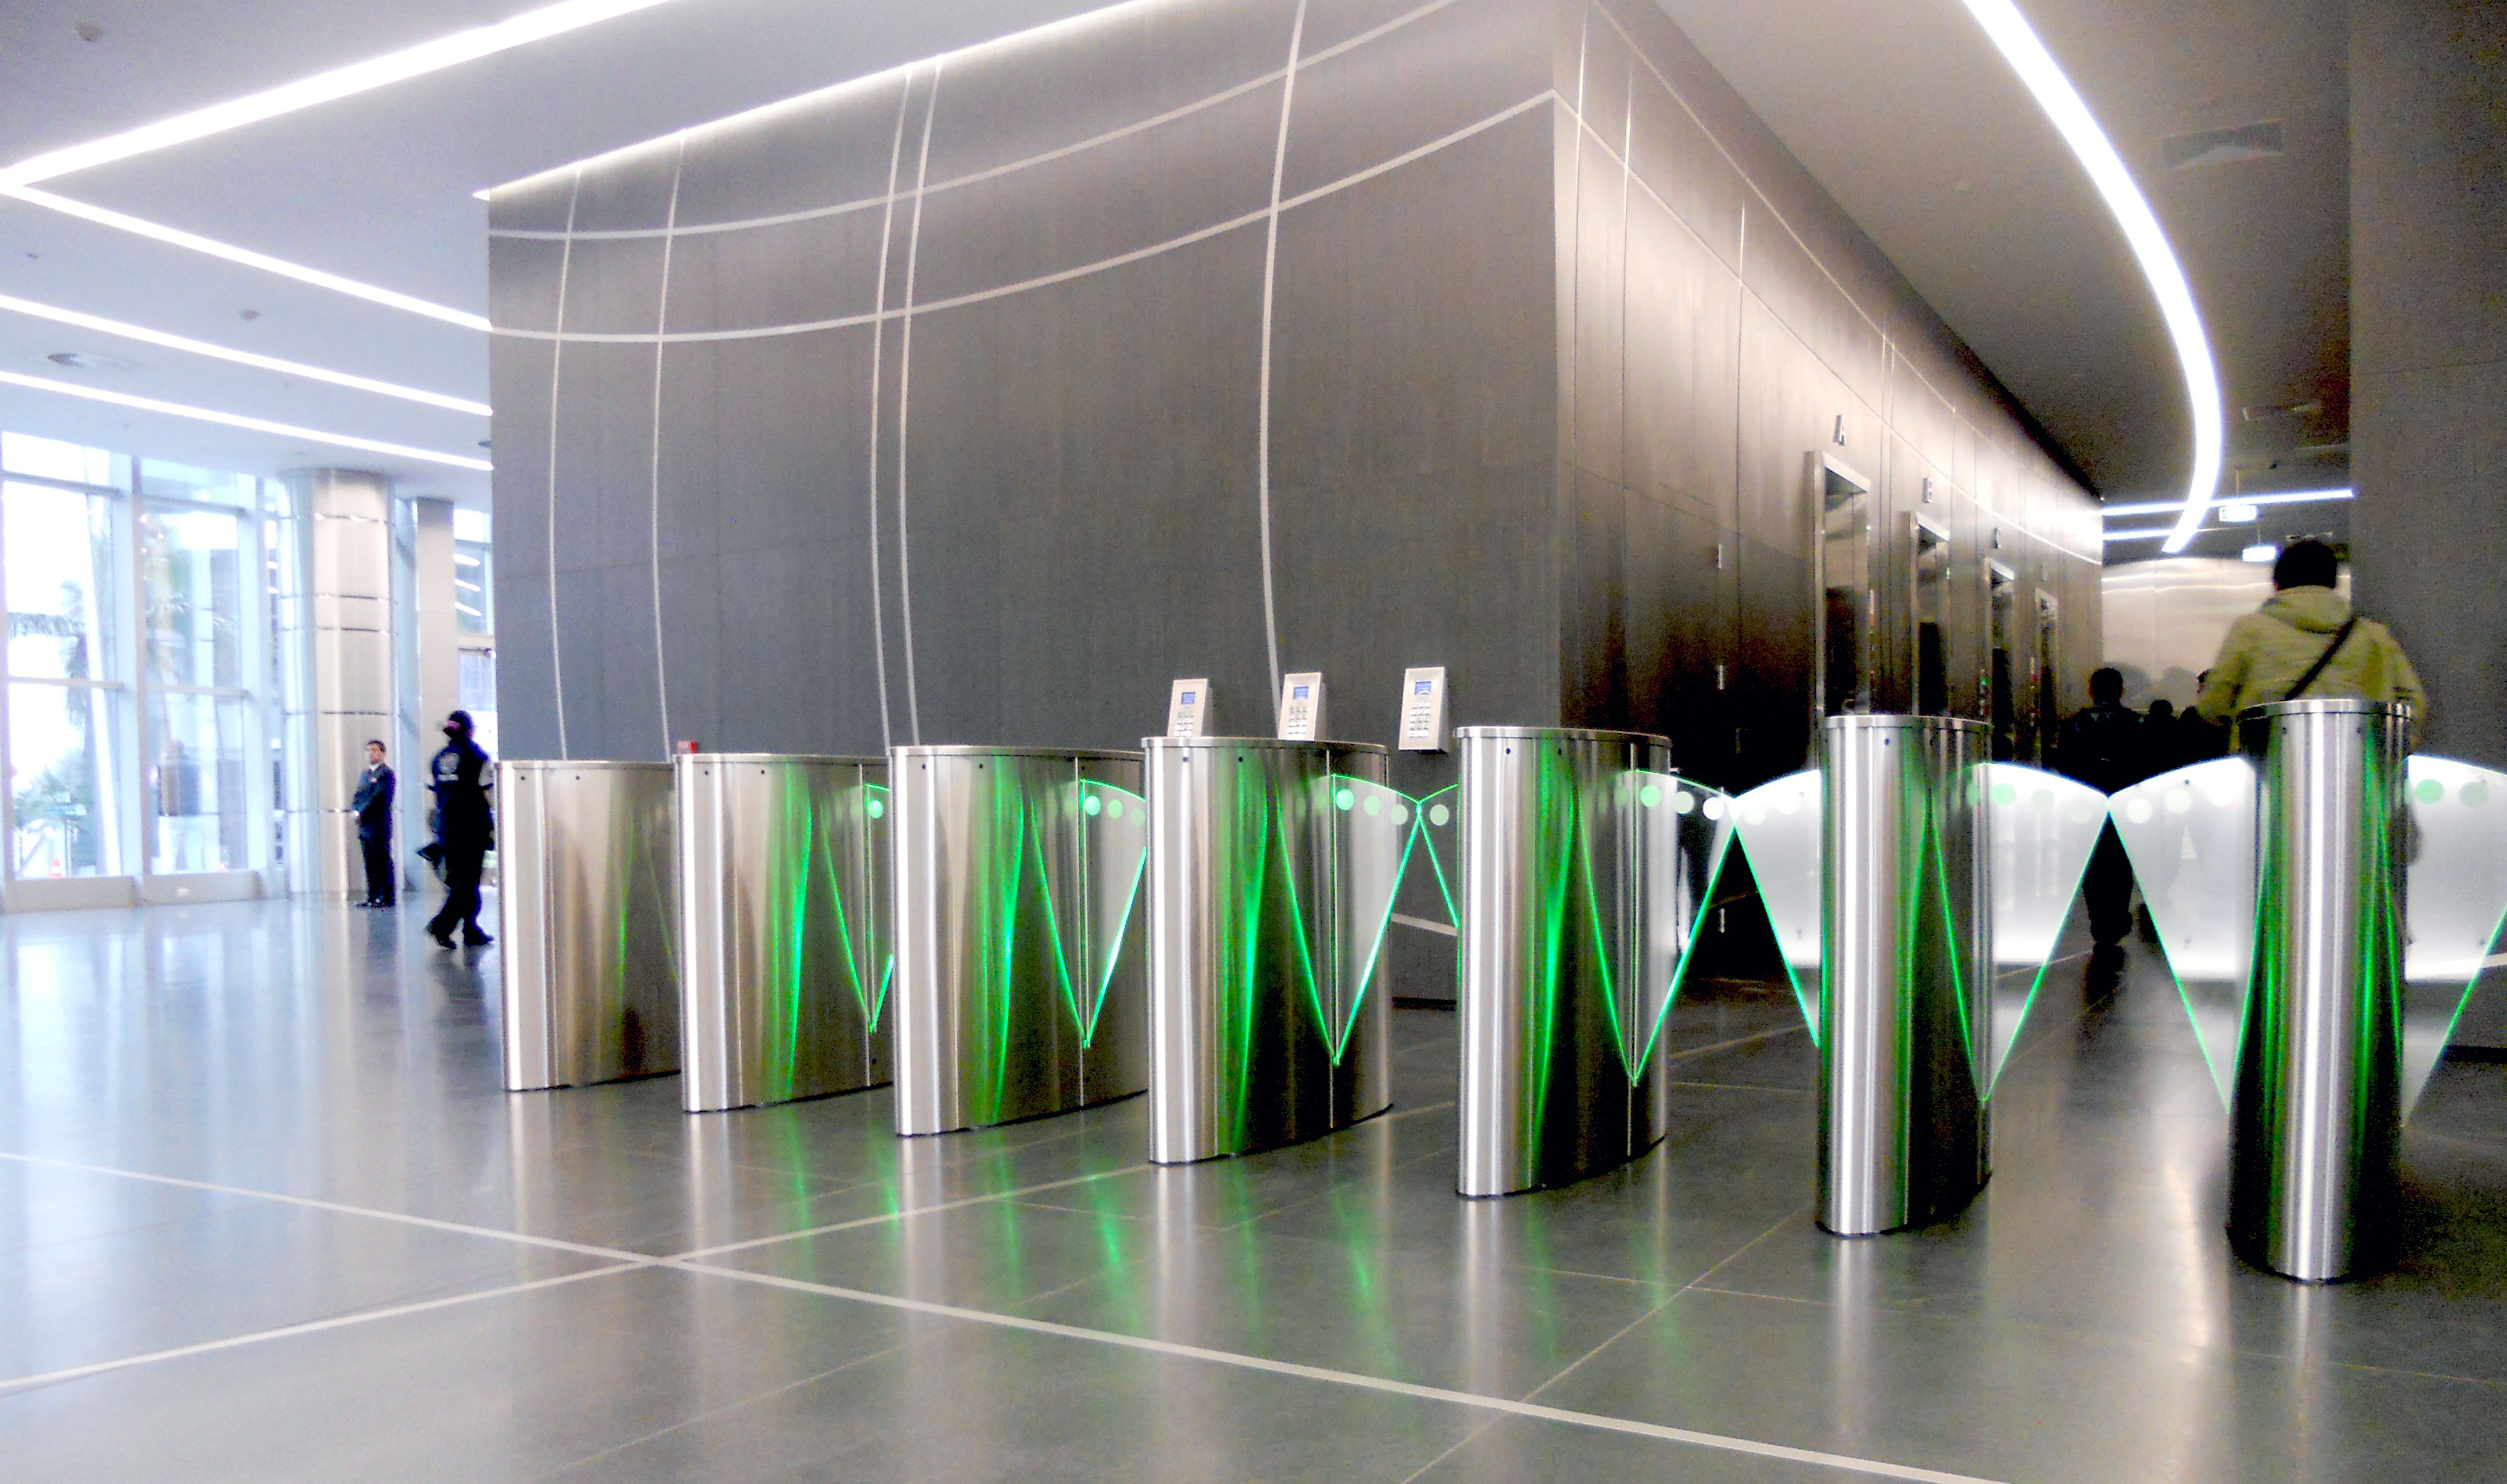 Urbanova standardizes on boon edam turnstiles for all its - Boon edam porte tambour ...